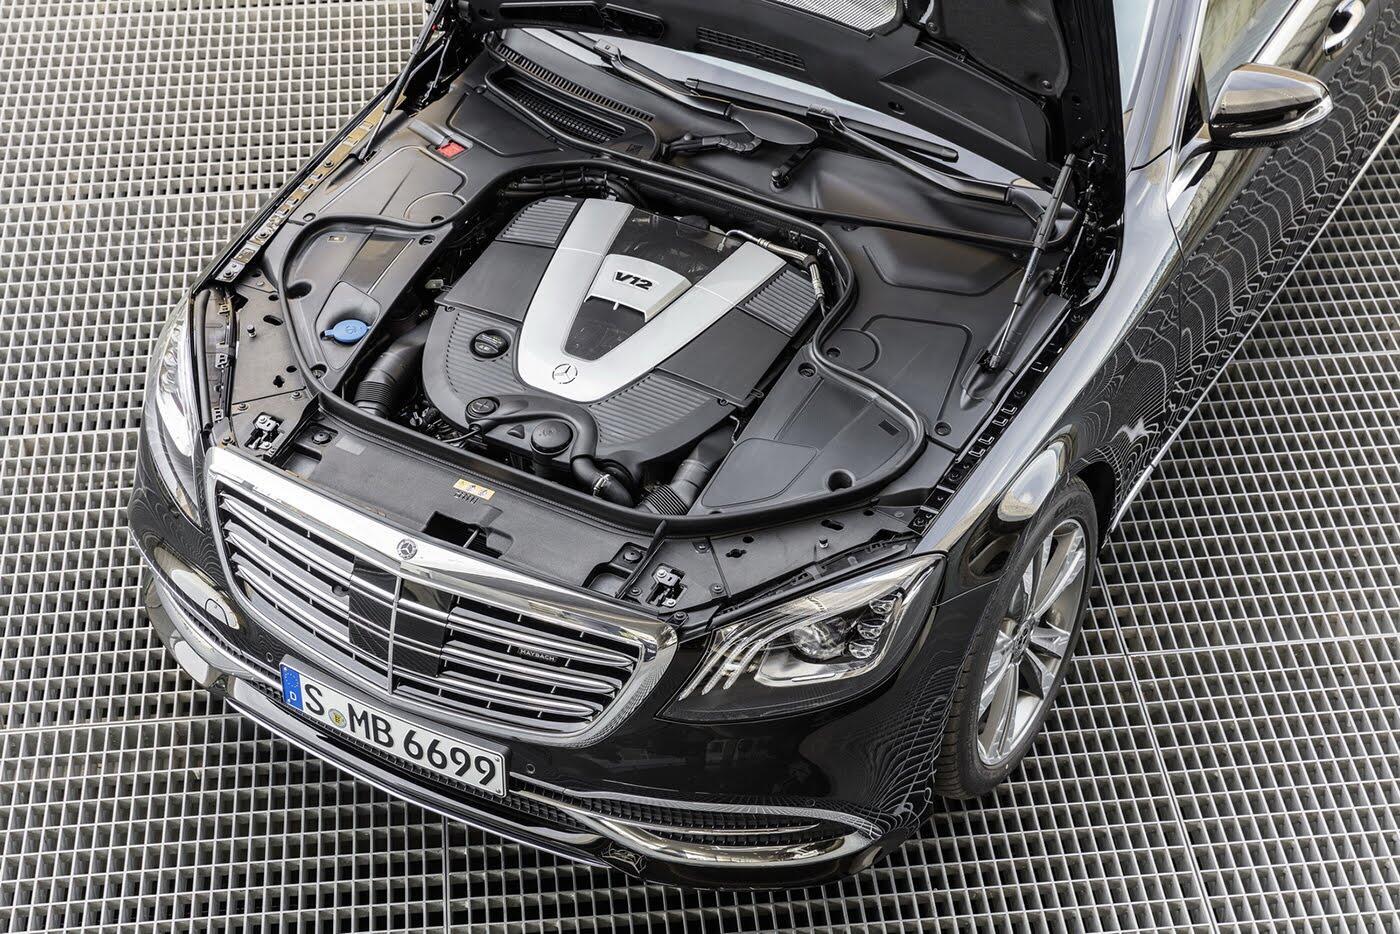 Ảnh chi tiết Mercedes-Benz S-Class 2018 - Hình 14